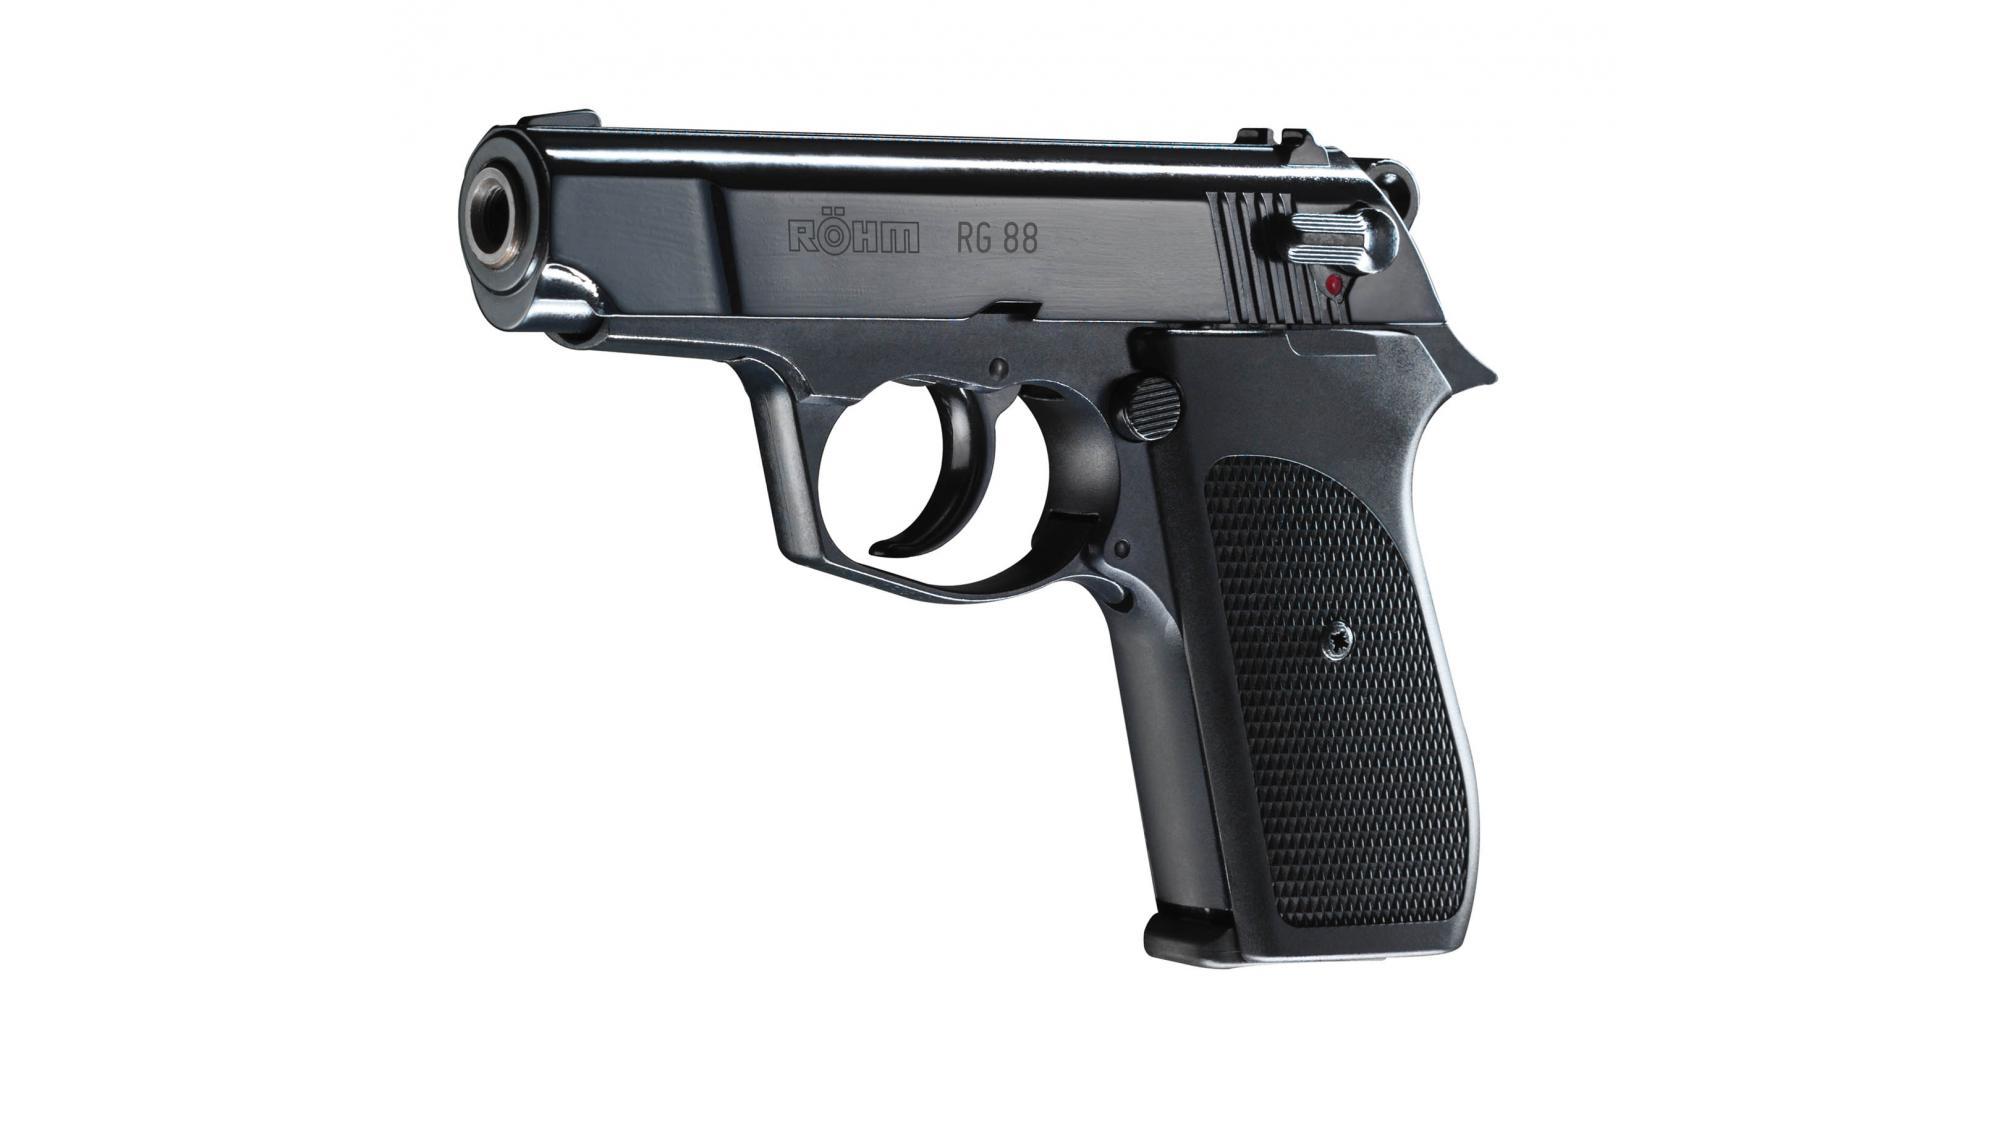 Röhm RG88 Schreckschusspistole, 9mm P.A.K